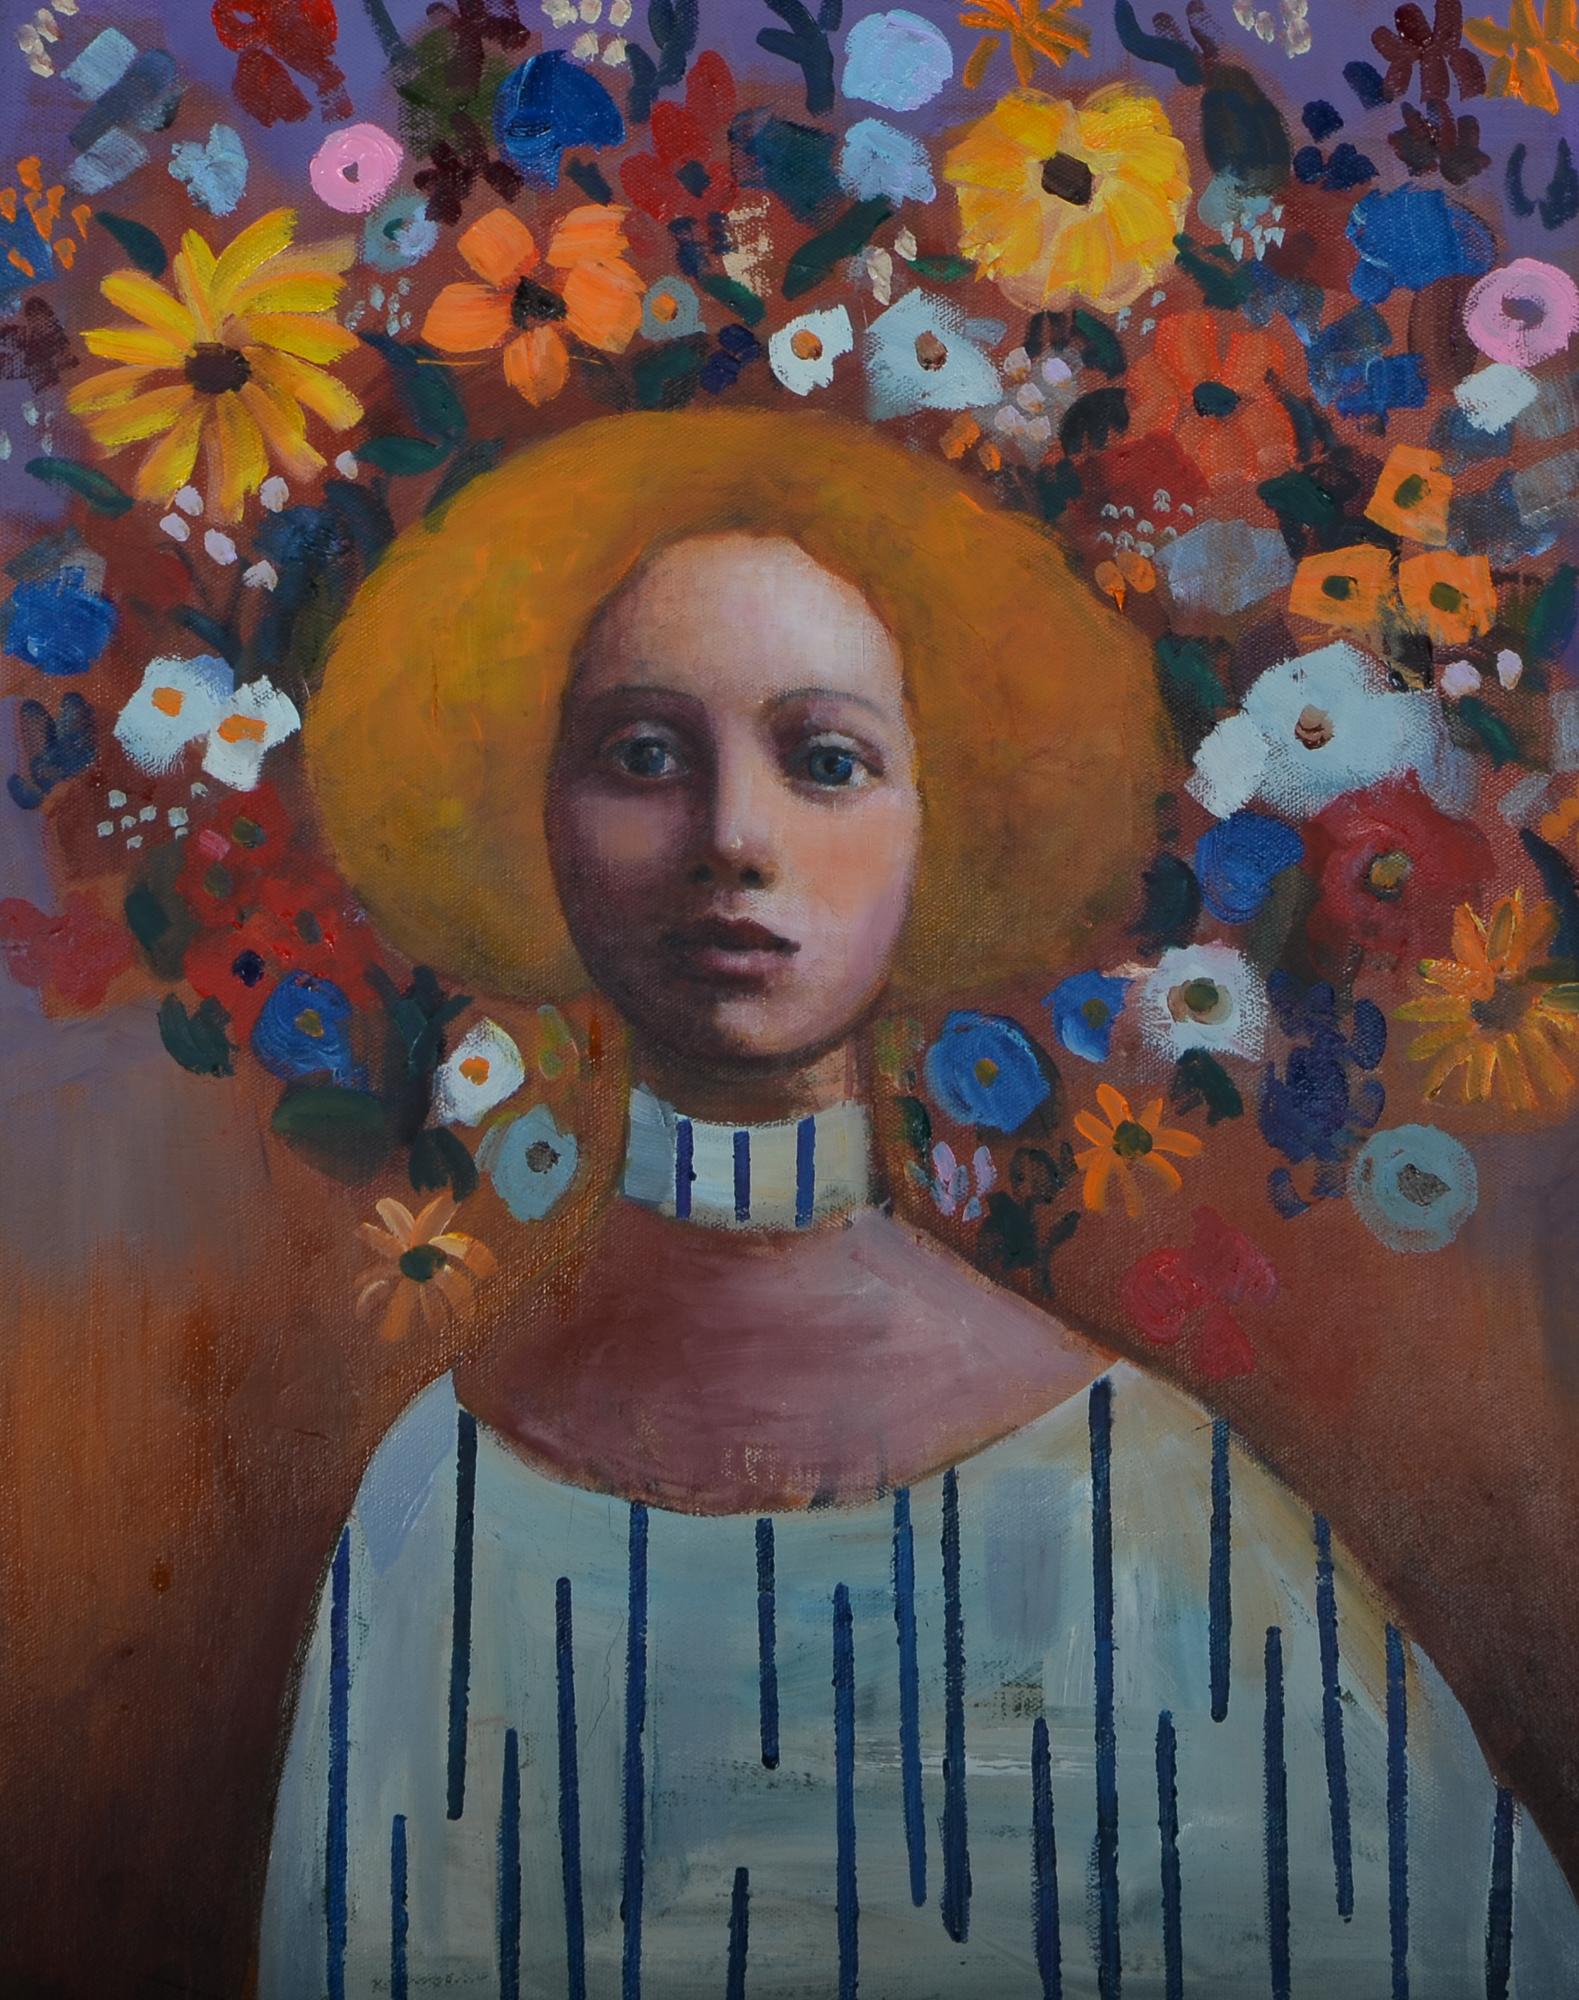 Sweet Illusion (20x16) oil on canvas 201